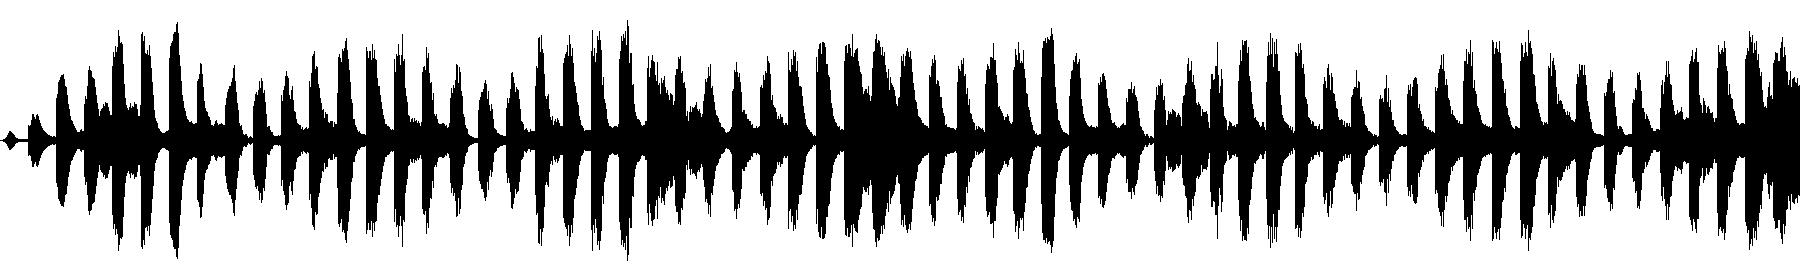 dts chordlp 27 cm wet